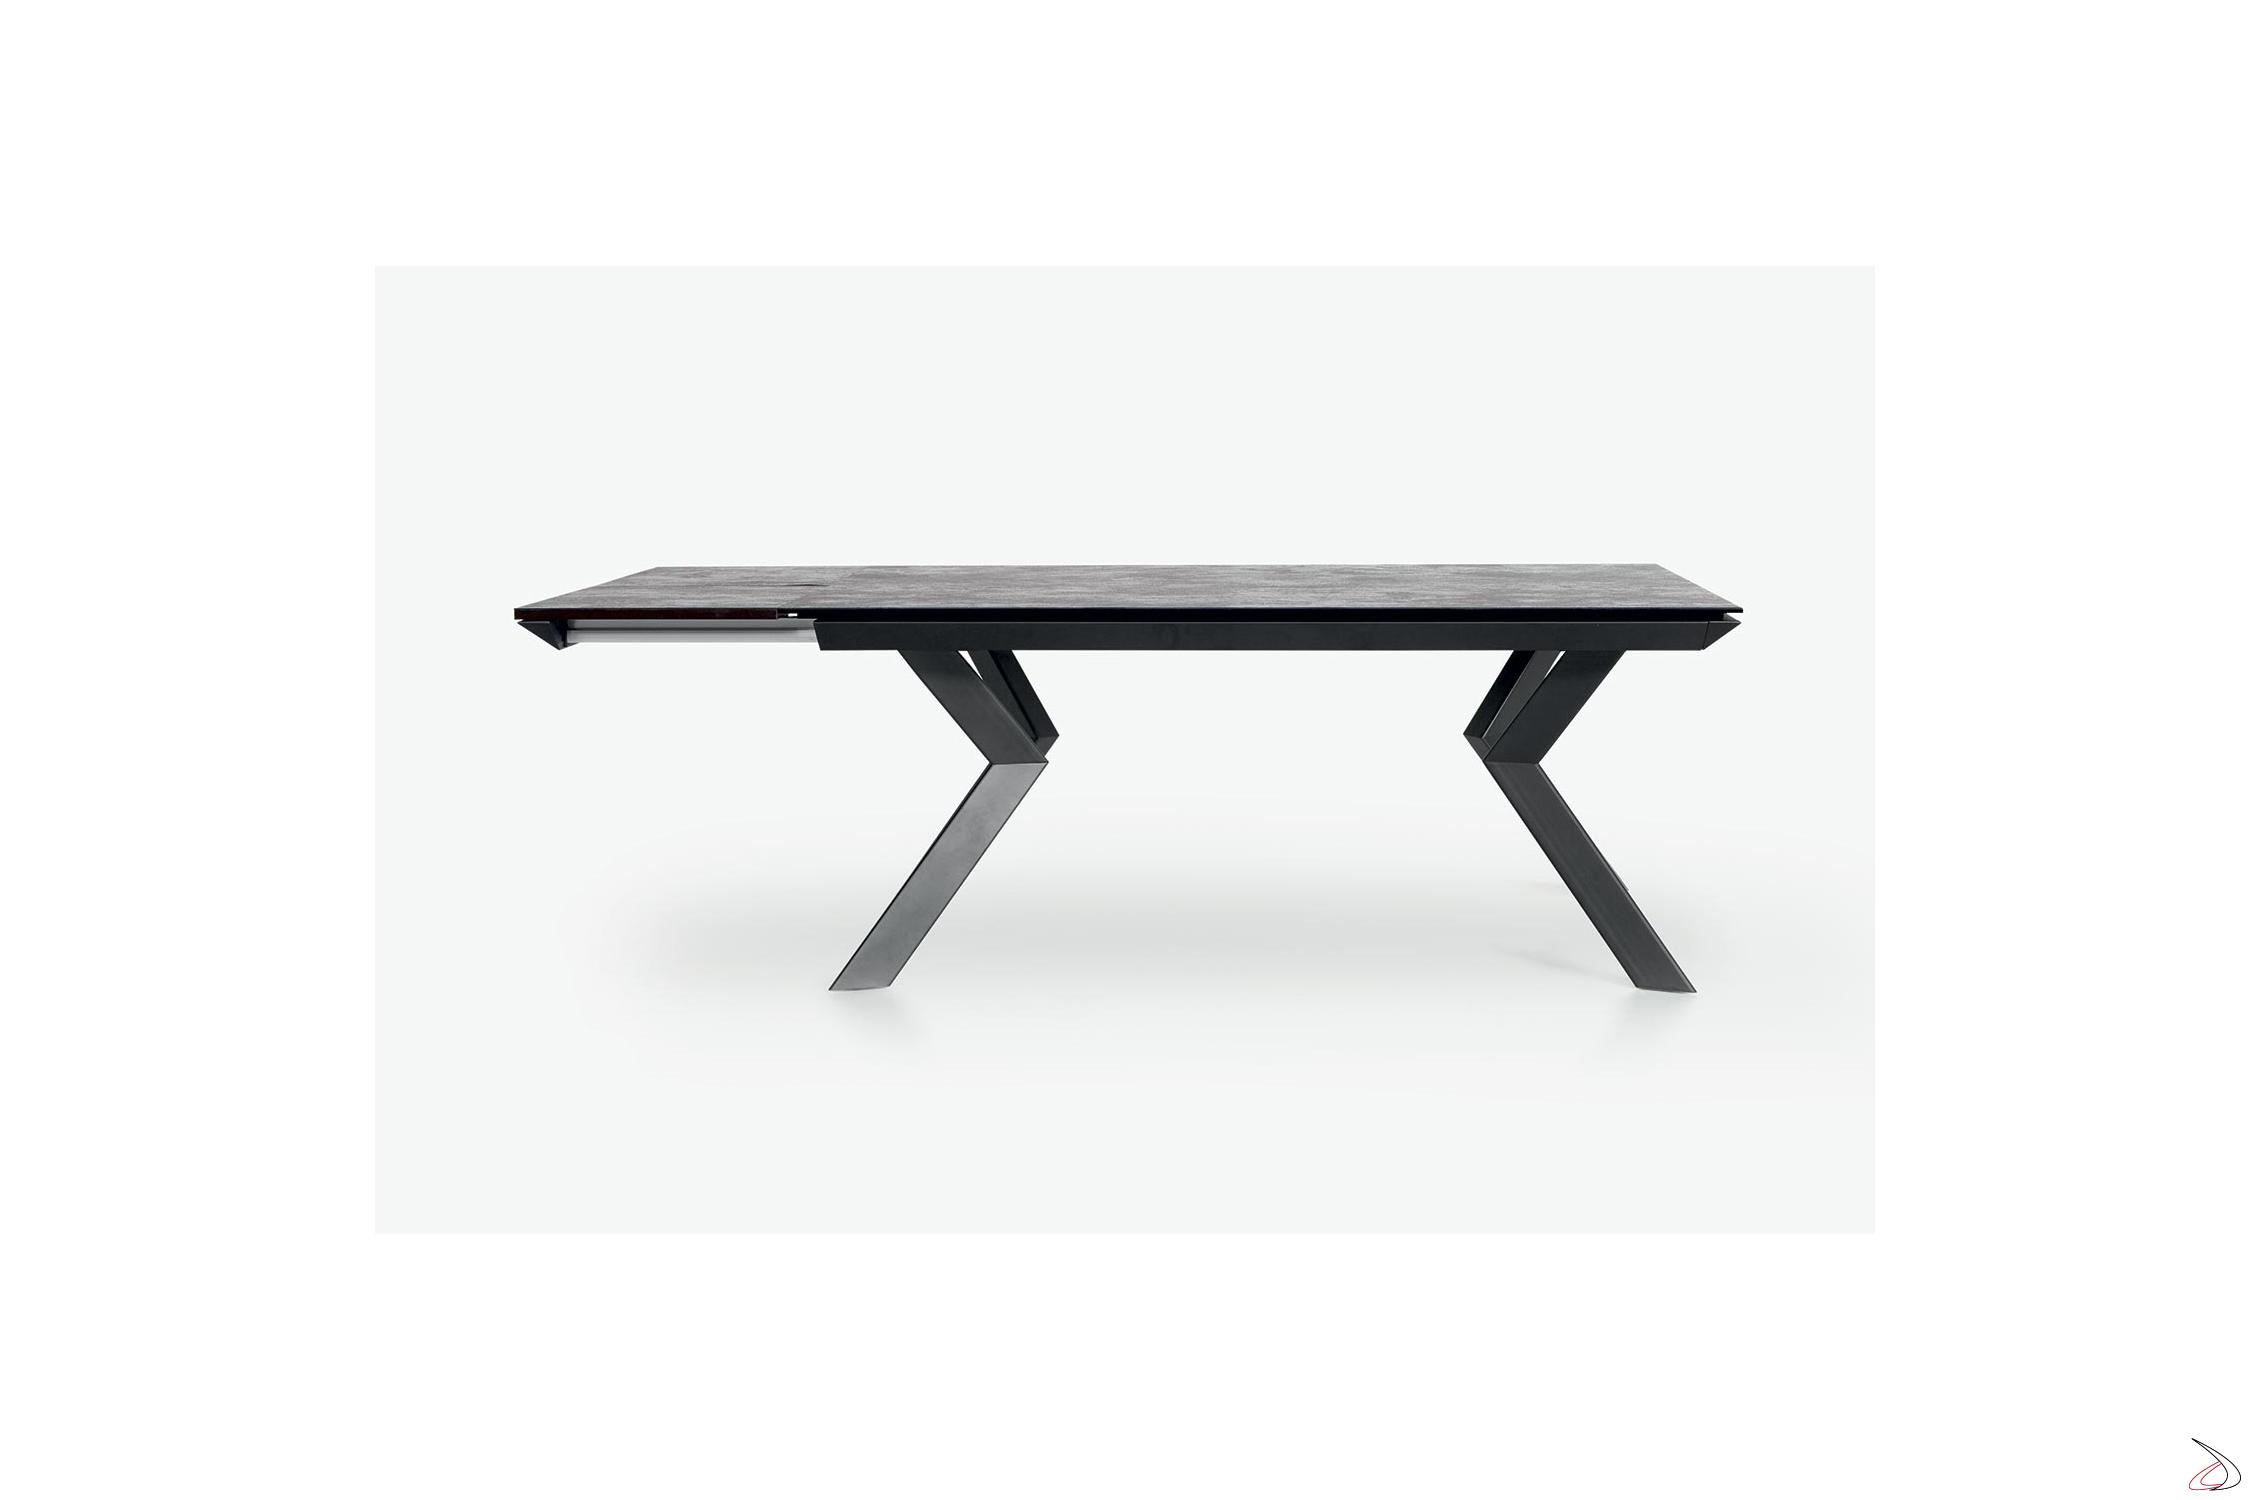 Tavolo Allungabile 4 Metri.Frank Customizable Extendable Table Toparredi Arredo Design Online